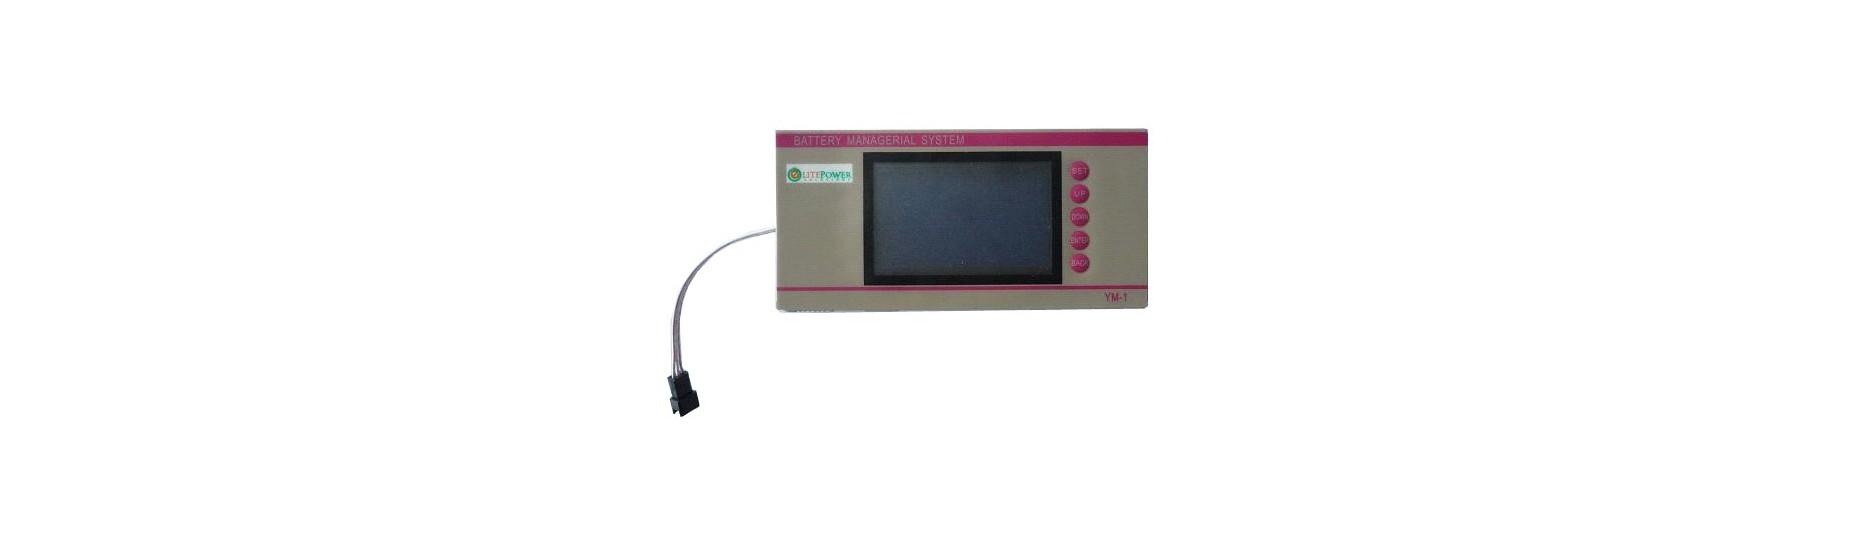 bms lifepo balancer monitor